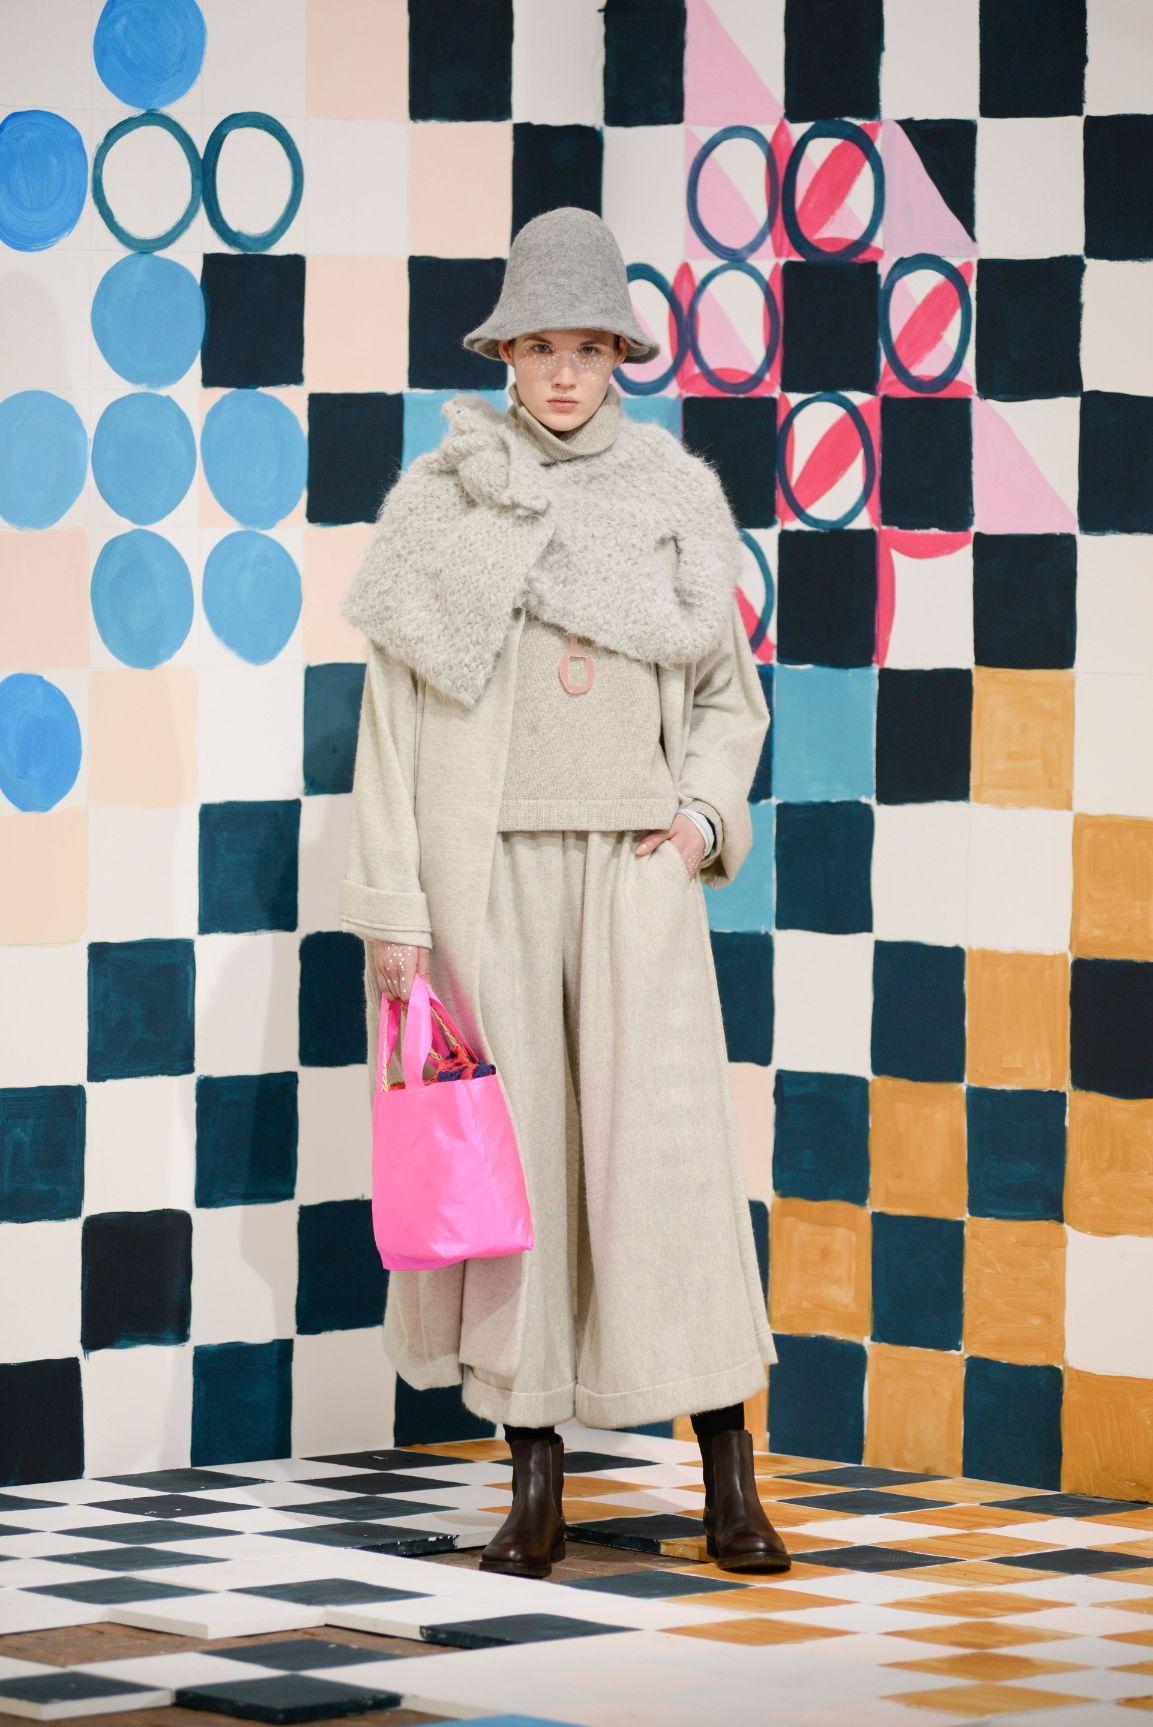 milan-fashion-week--daniela-gregis-autumn-winter-2022-collection-01...daniela_gregis...tintinbà.._(23).jpg